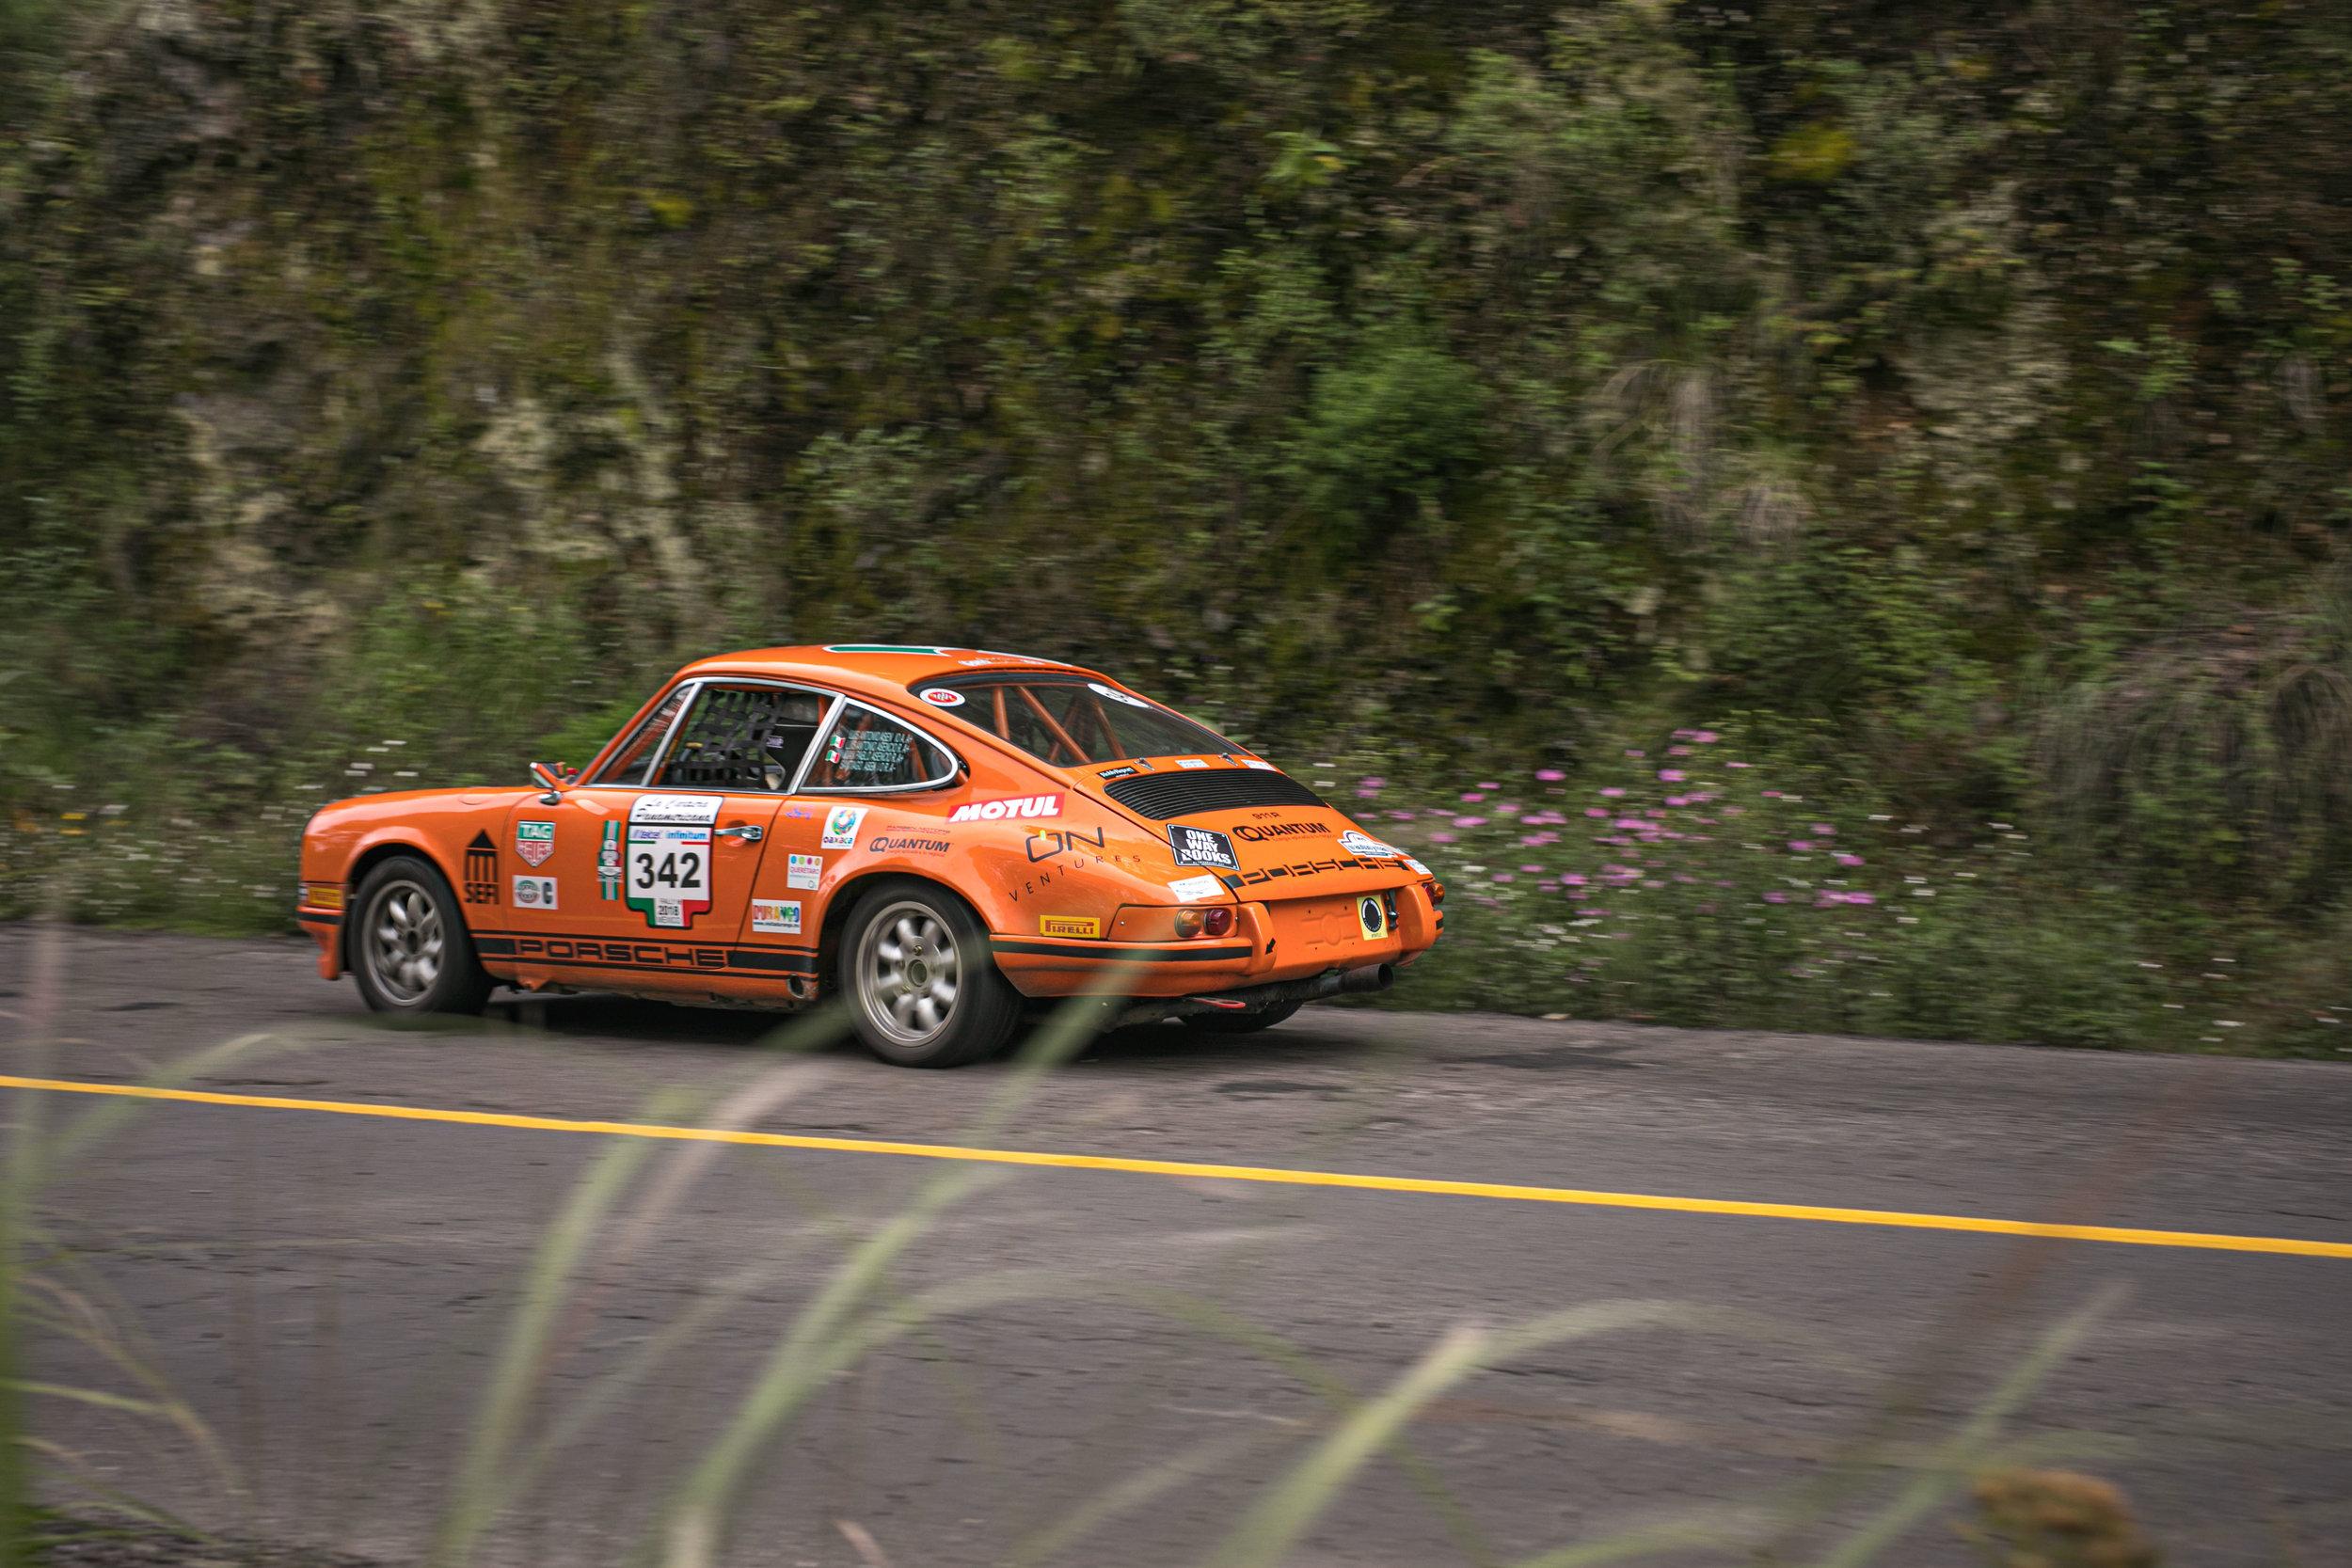 Carrera Panamericana_2 (1 of 3).jpg